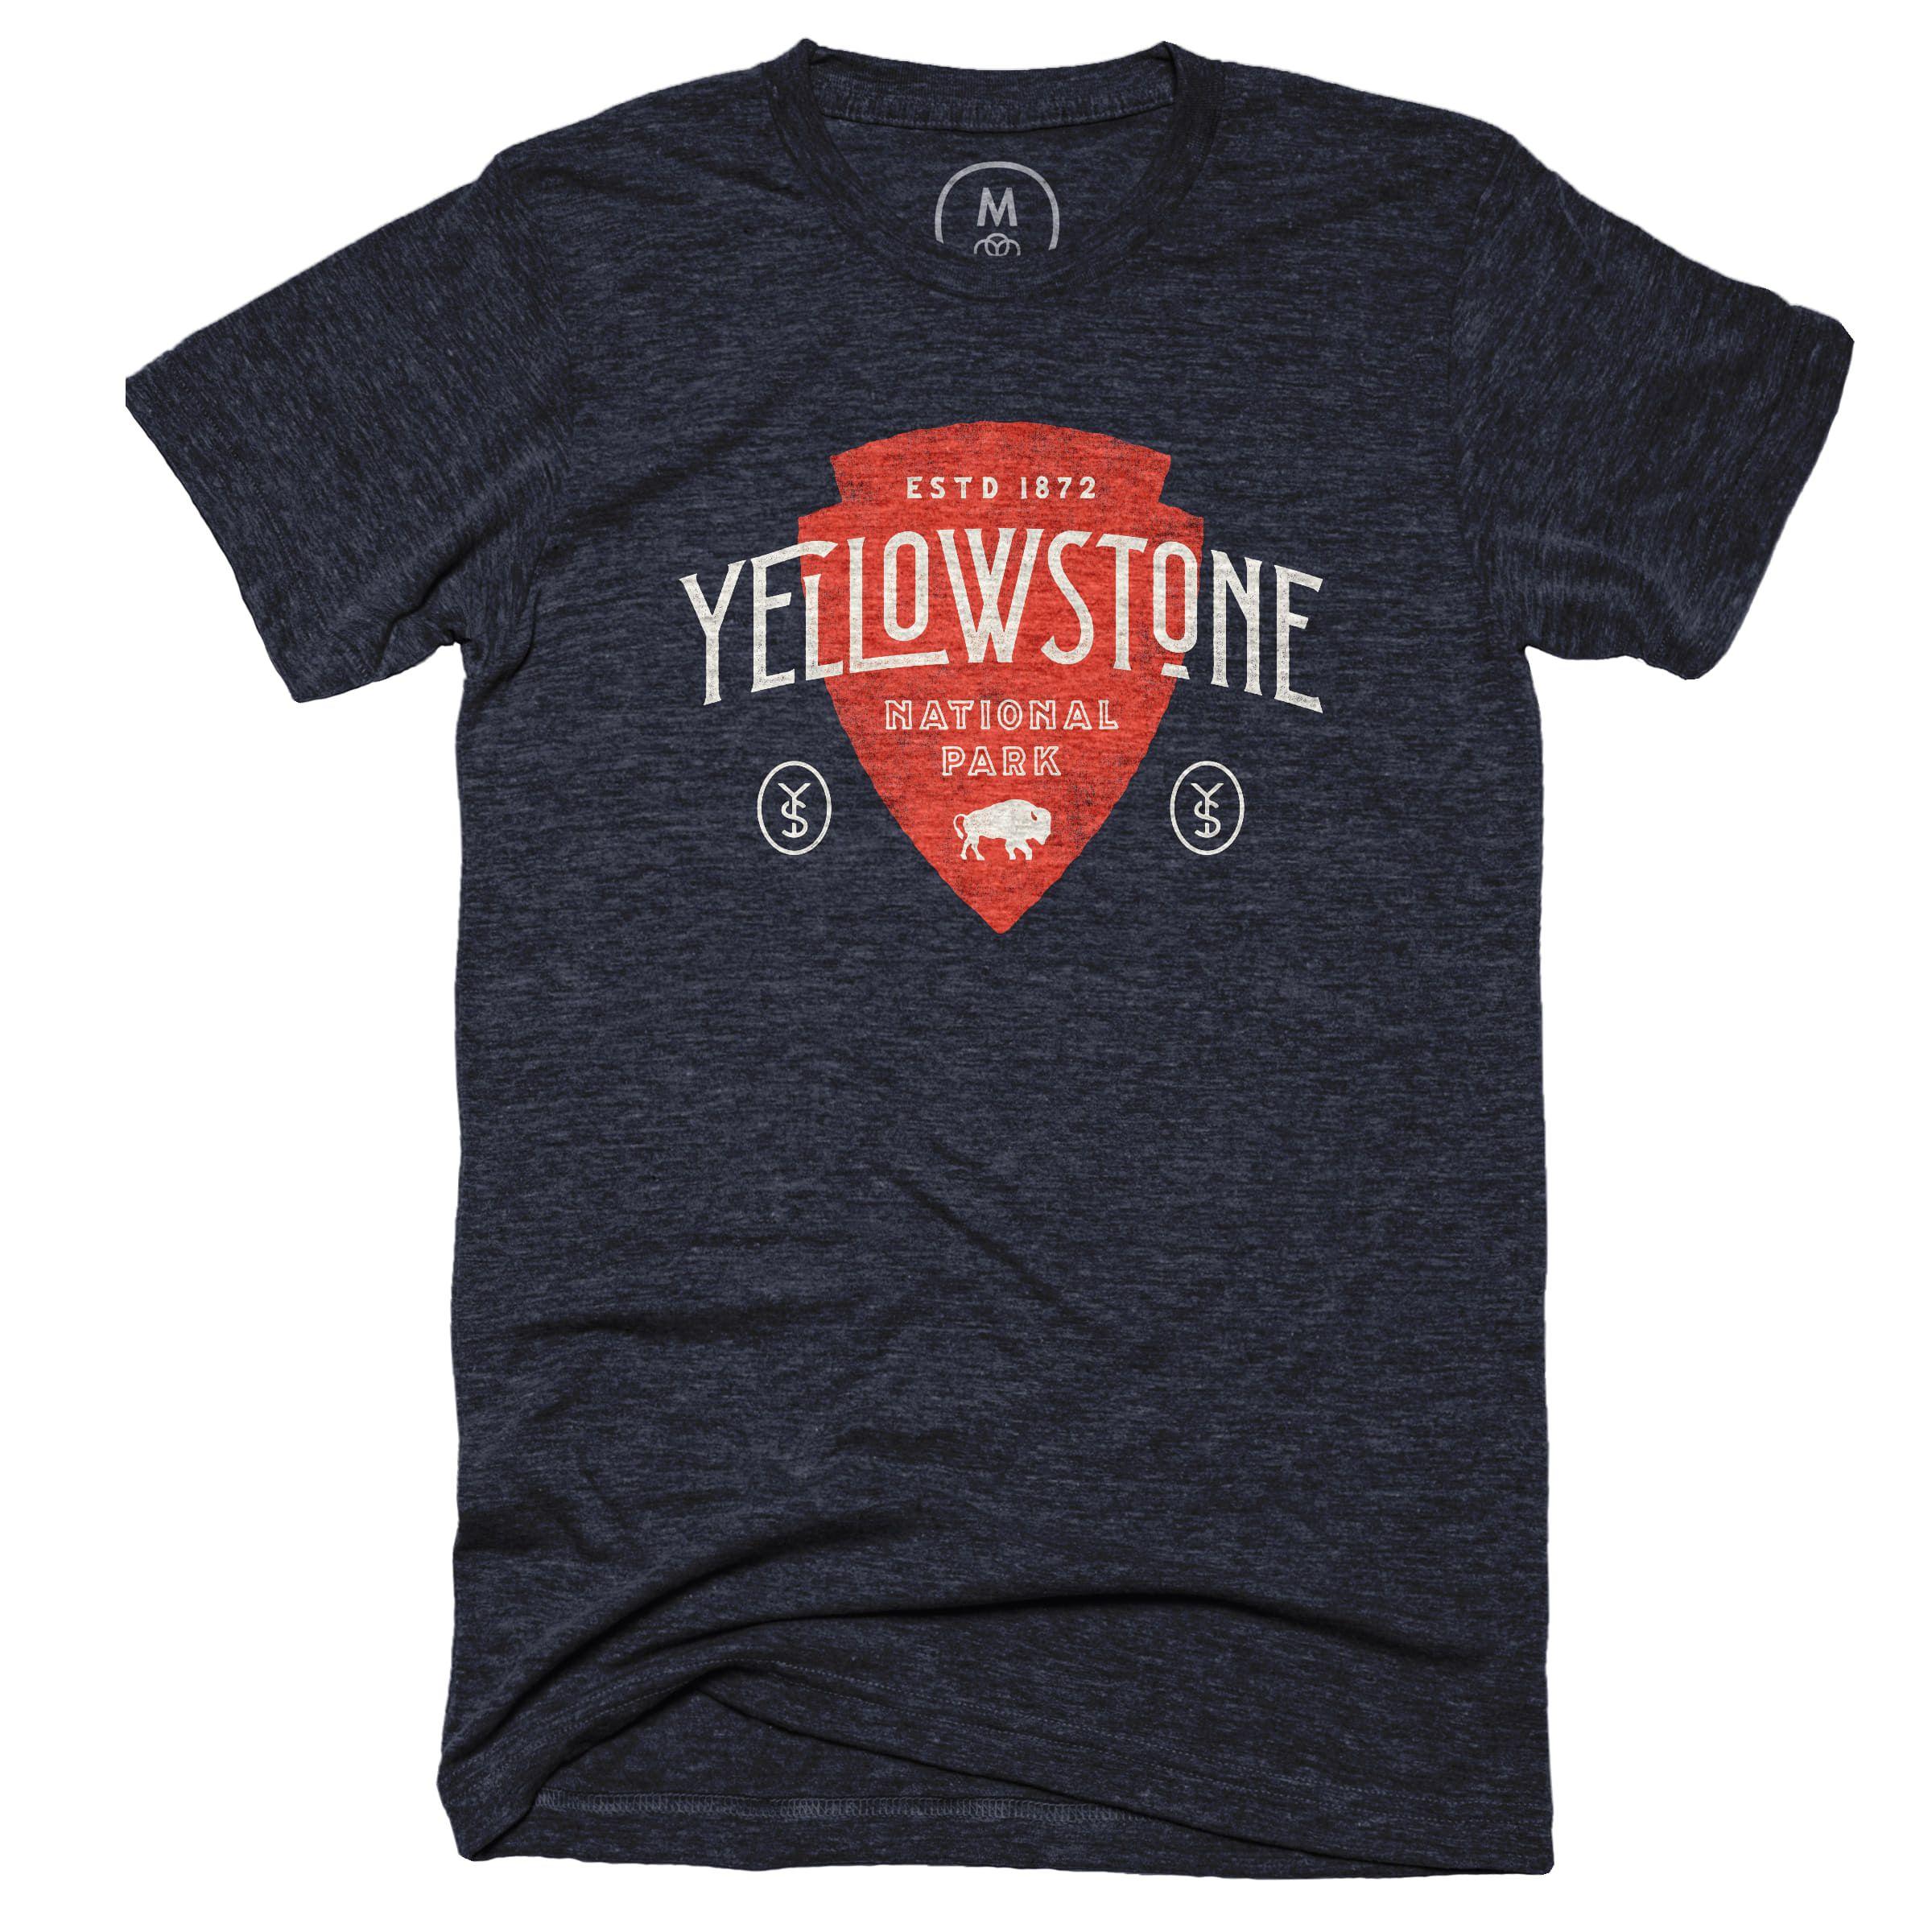 Yellowstone Vintage Navy (Men's)